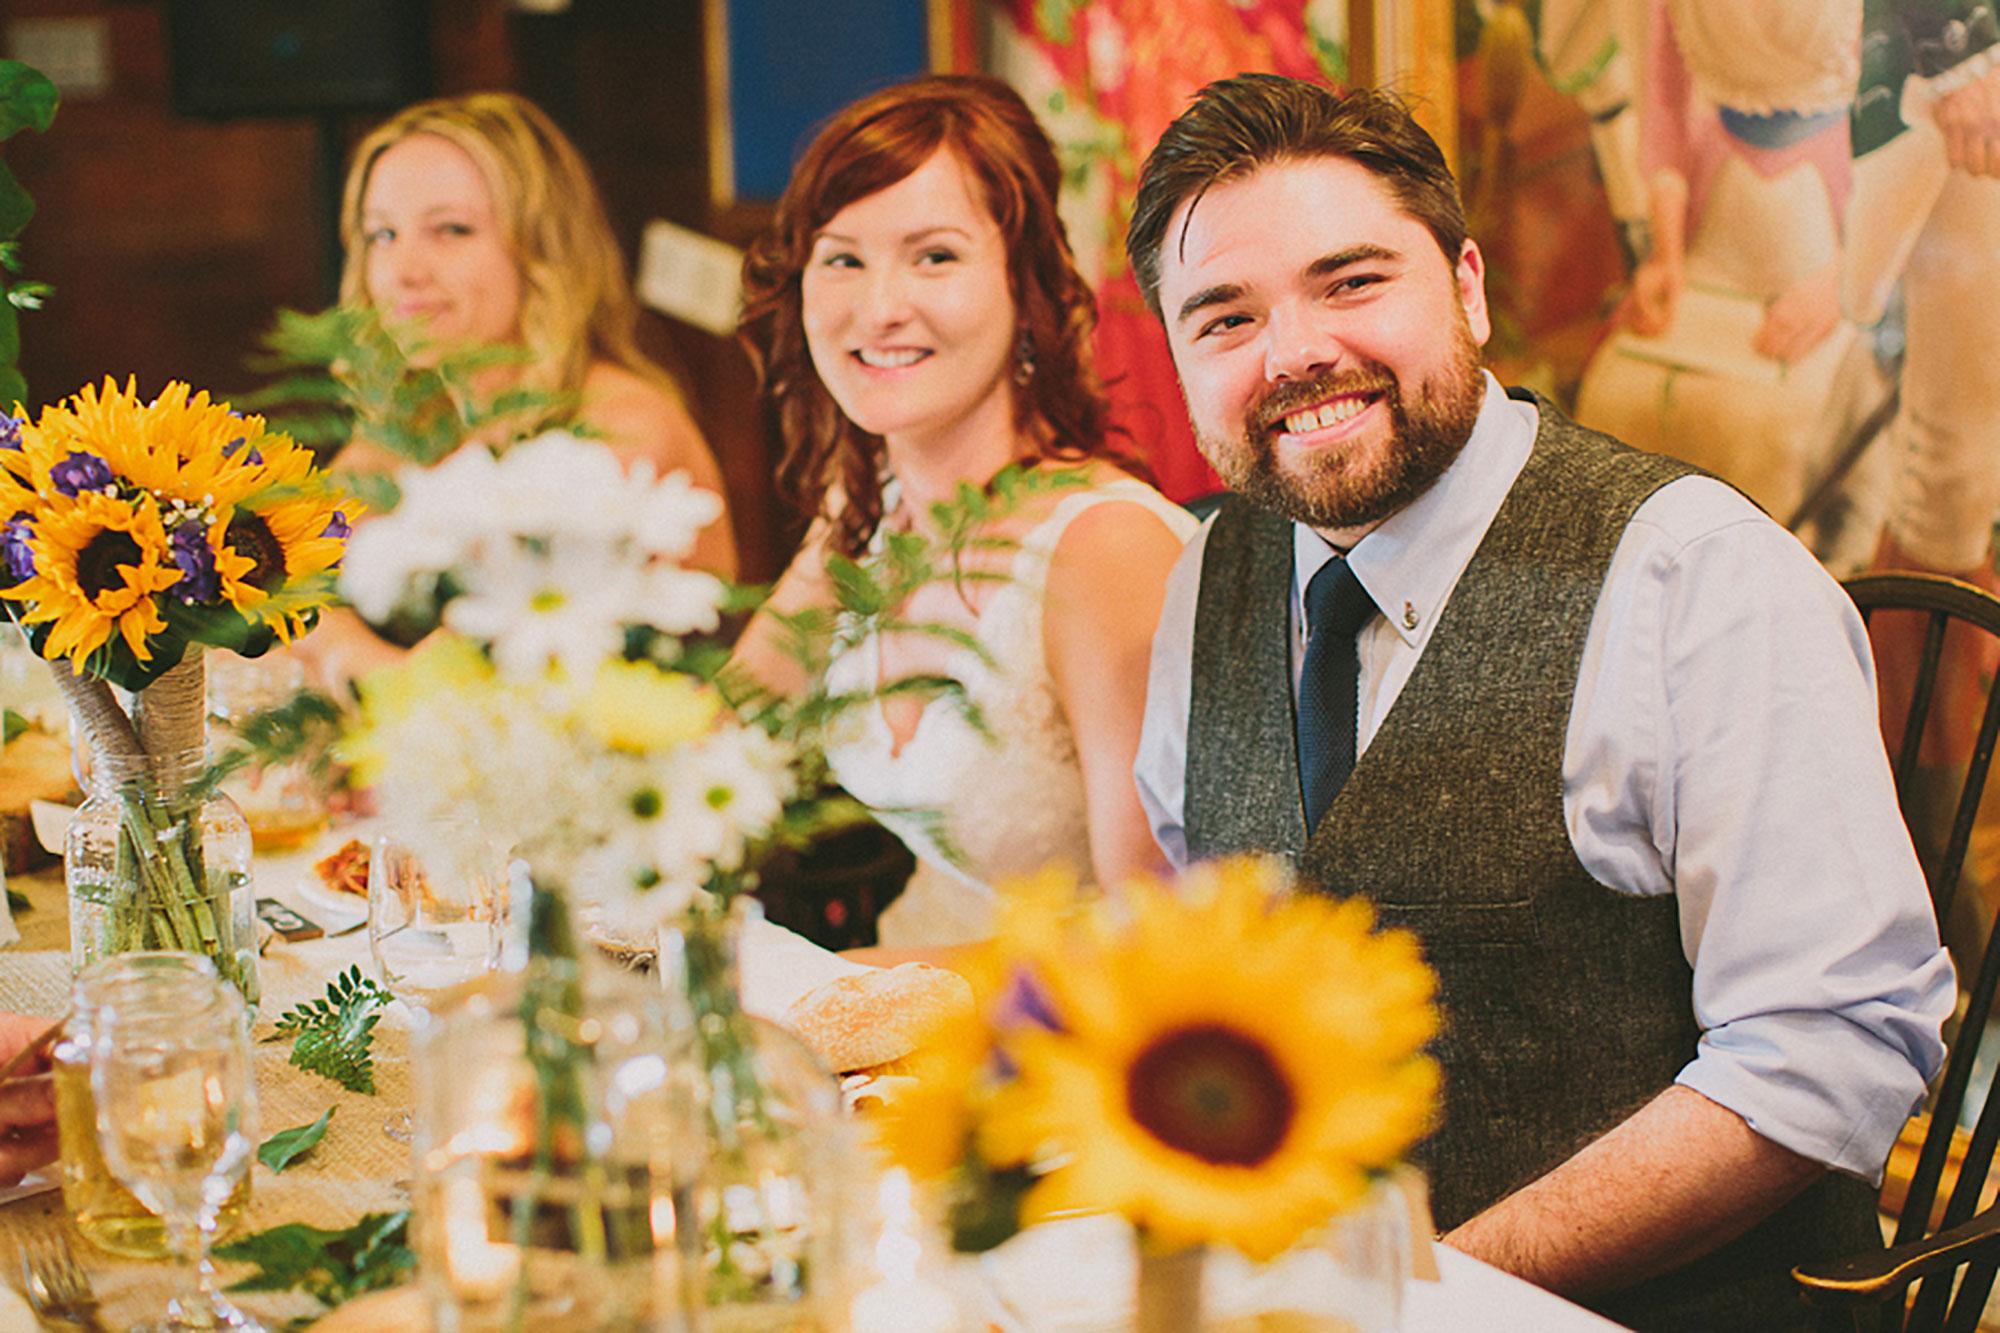 Navy-Hall-Wedding-Vineyard-Bride-Photo-By-Andrew-Mark-Photography-041.jpg